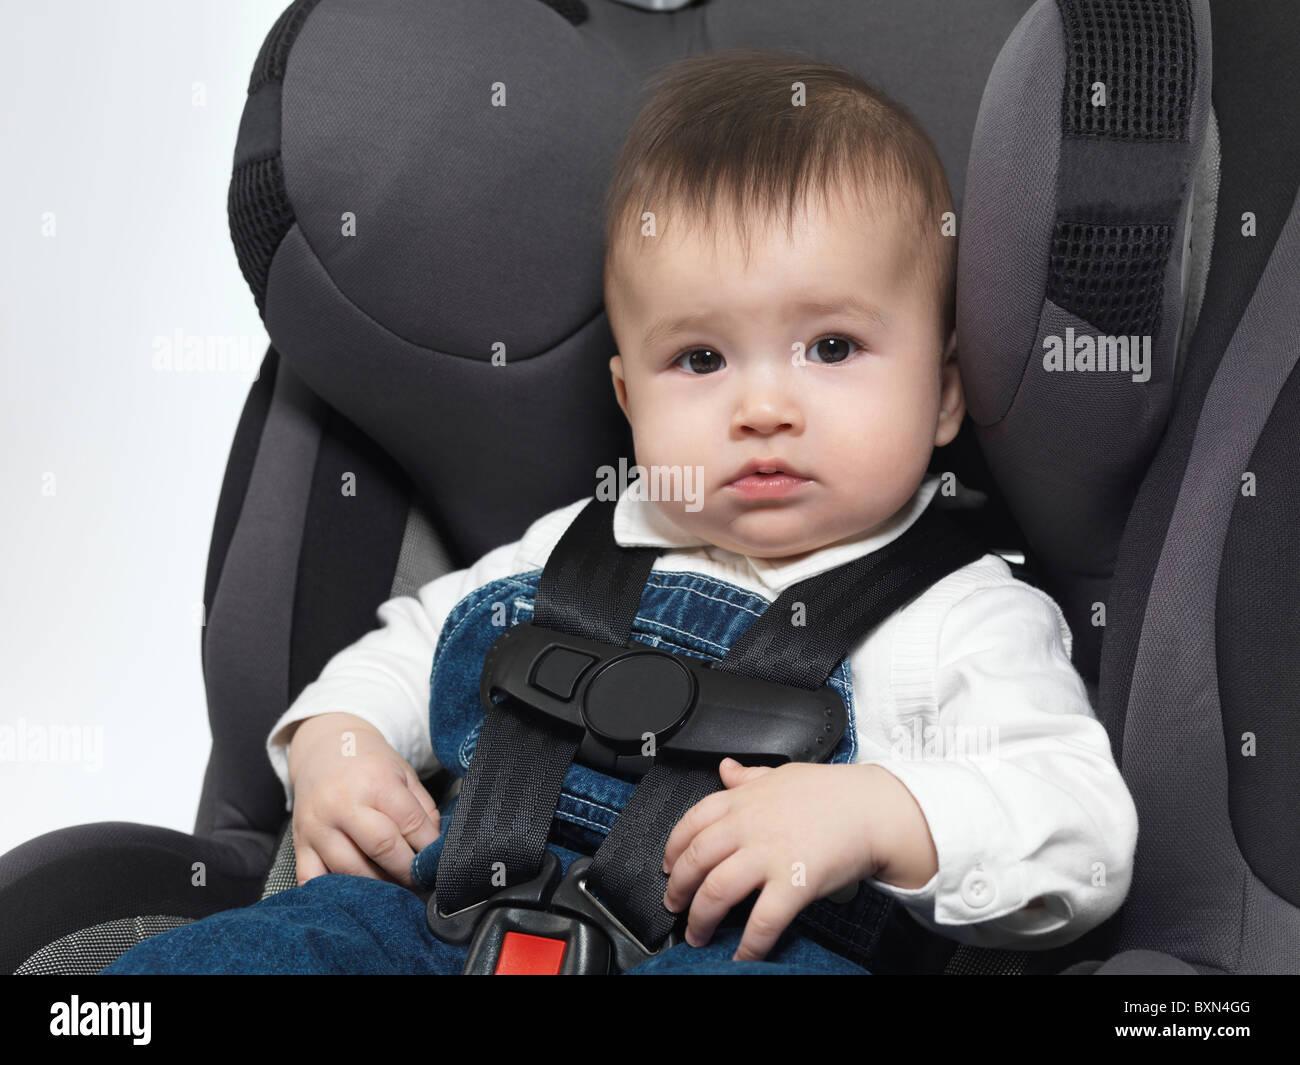 Sette mesi baby sitting in un Booster seat Immagini Stock